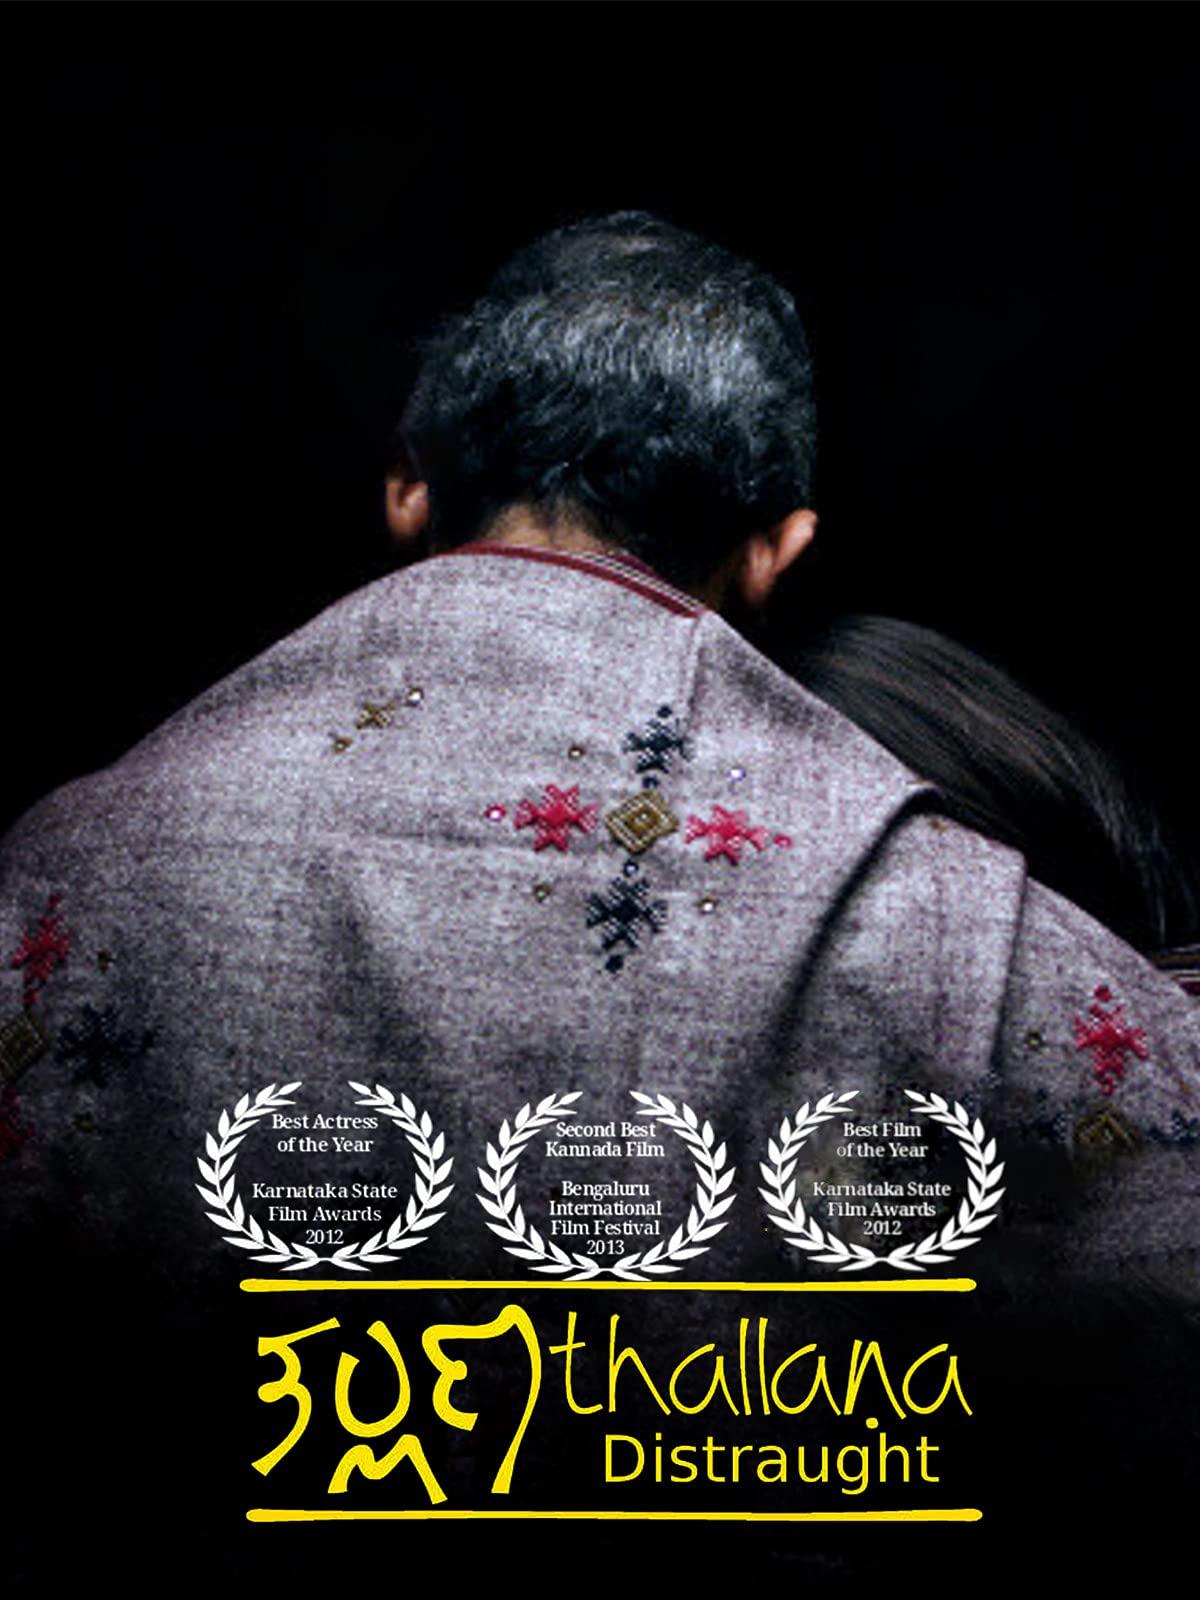 Thallana